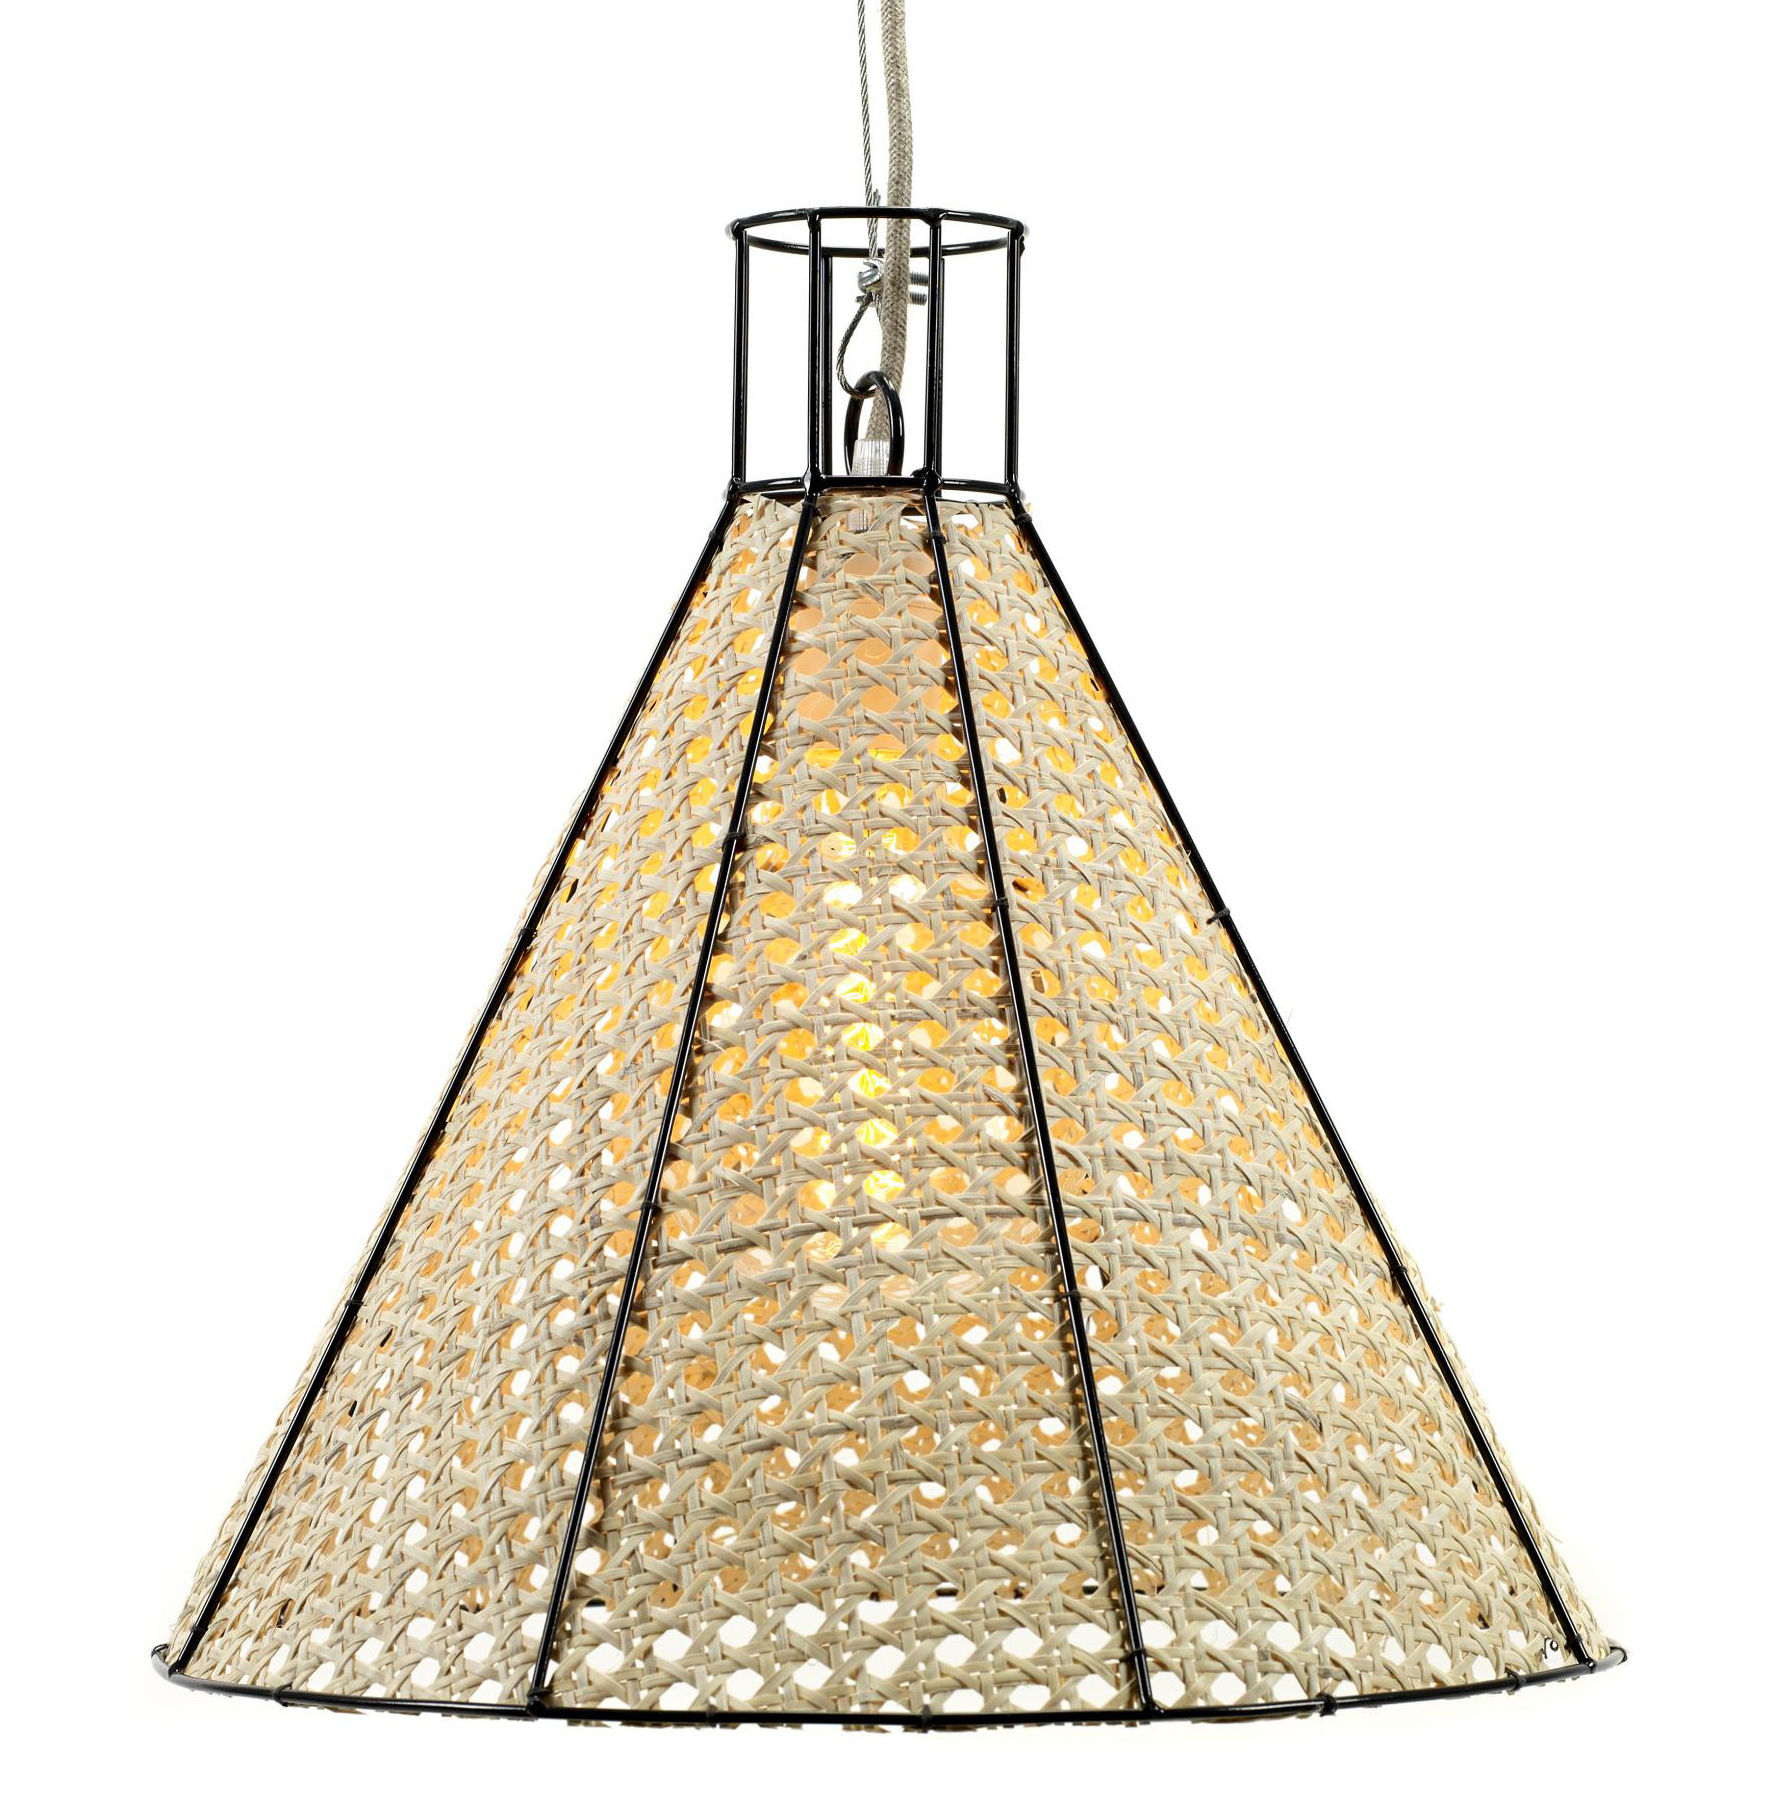 Ranarp Pendant Lamp Black 38 Cm: Ø 38 X H 37 Cm Natural Straw / Black